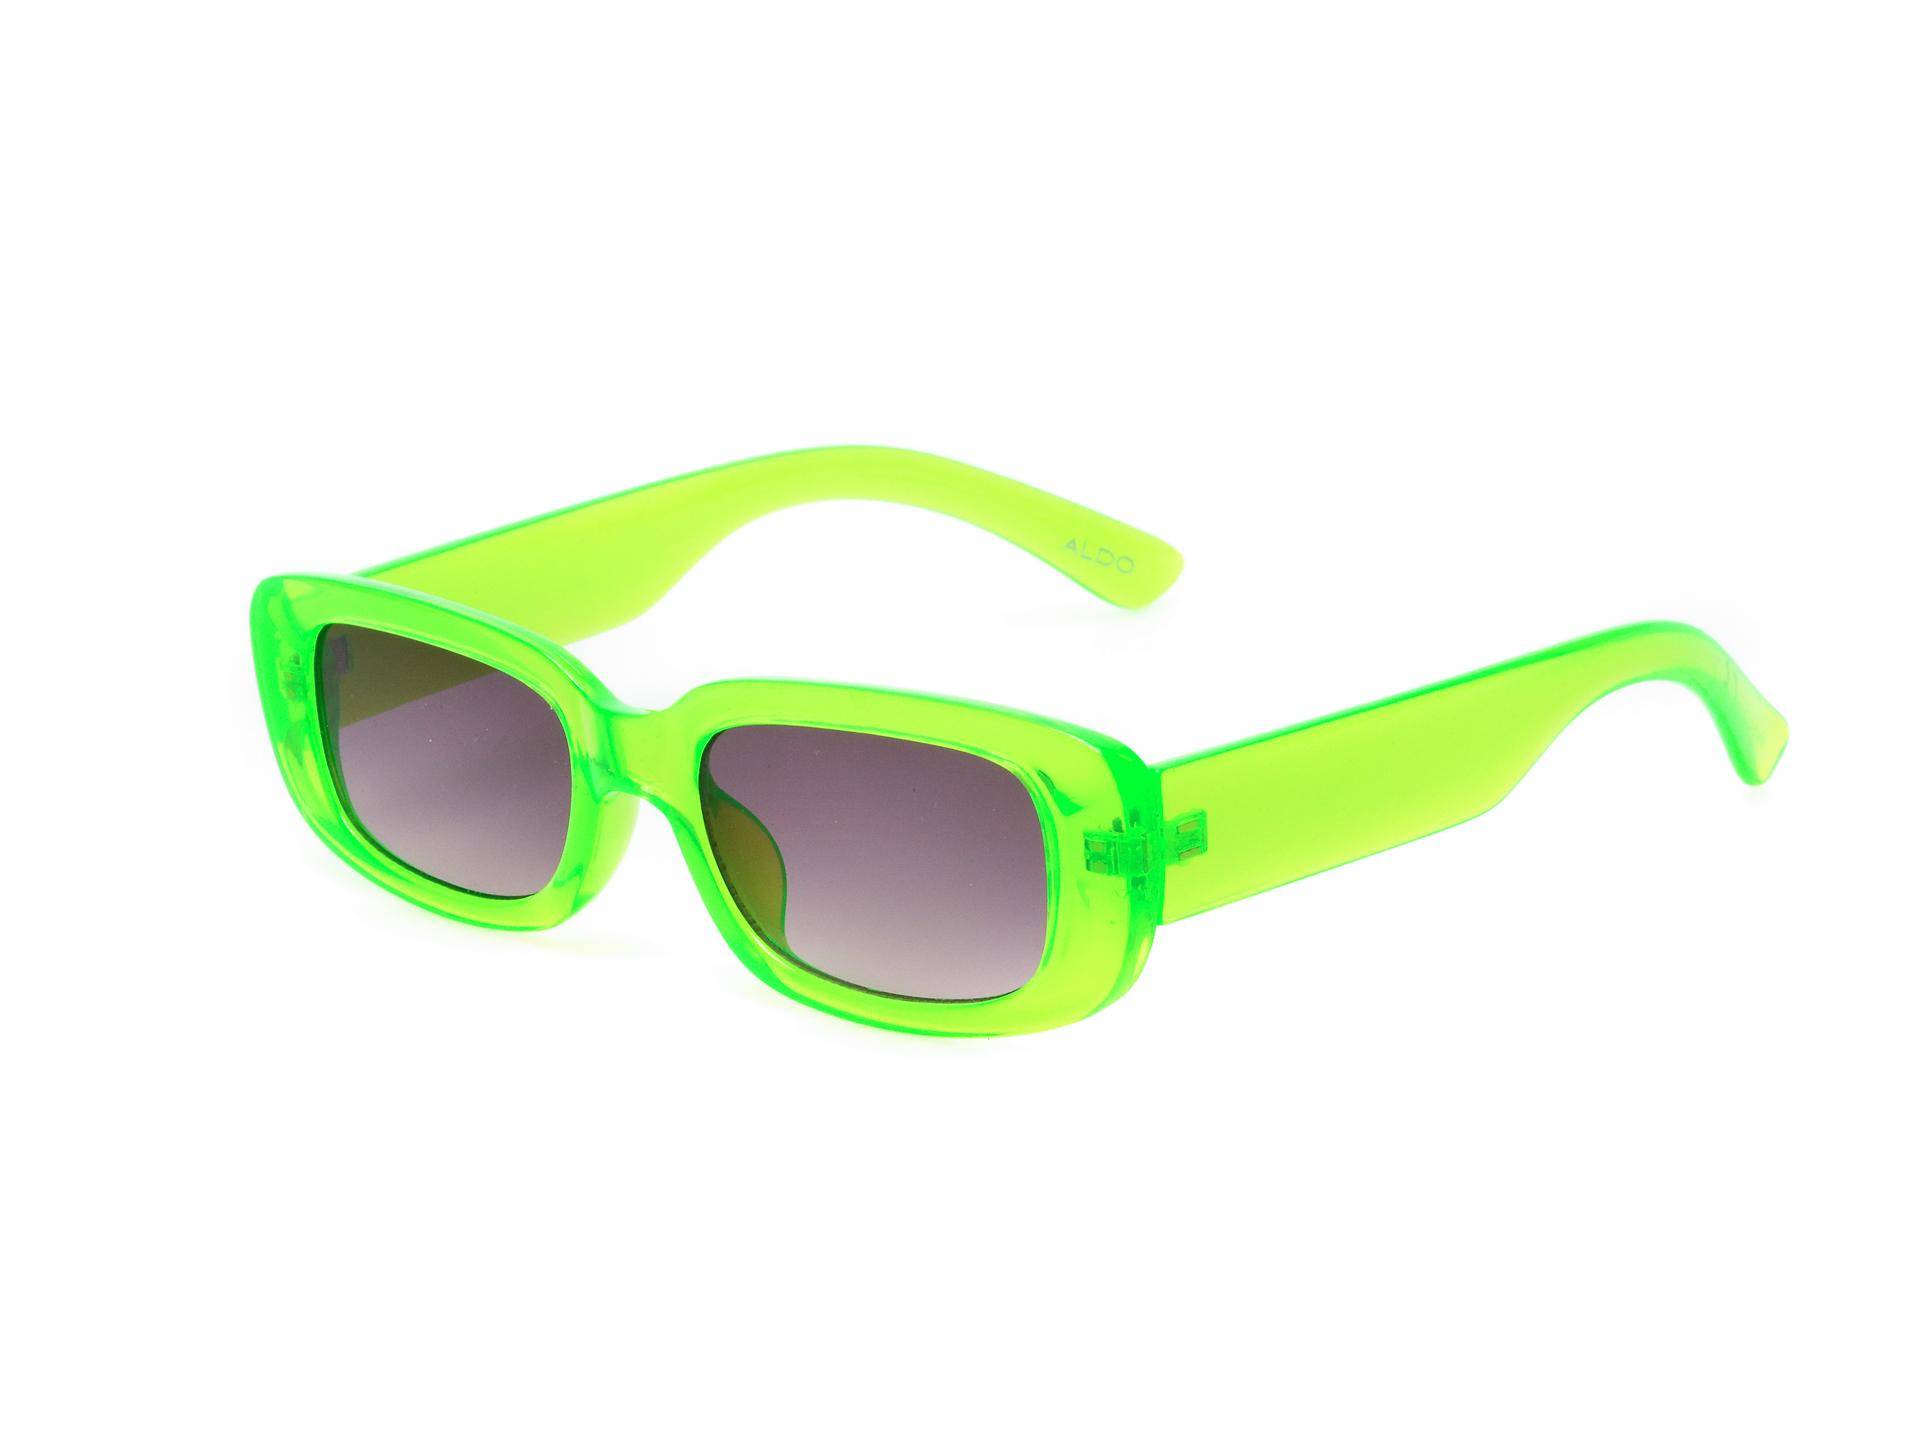 Ochelari de soare ALDO verzi, Oloarwen320, din pvc imagine otter.ro 2021